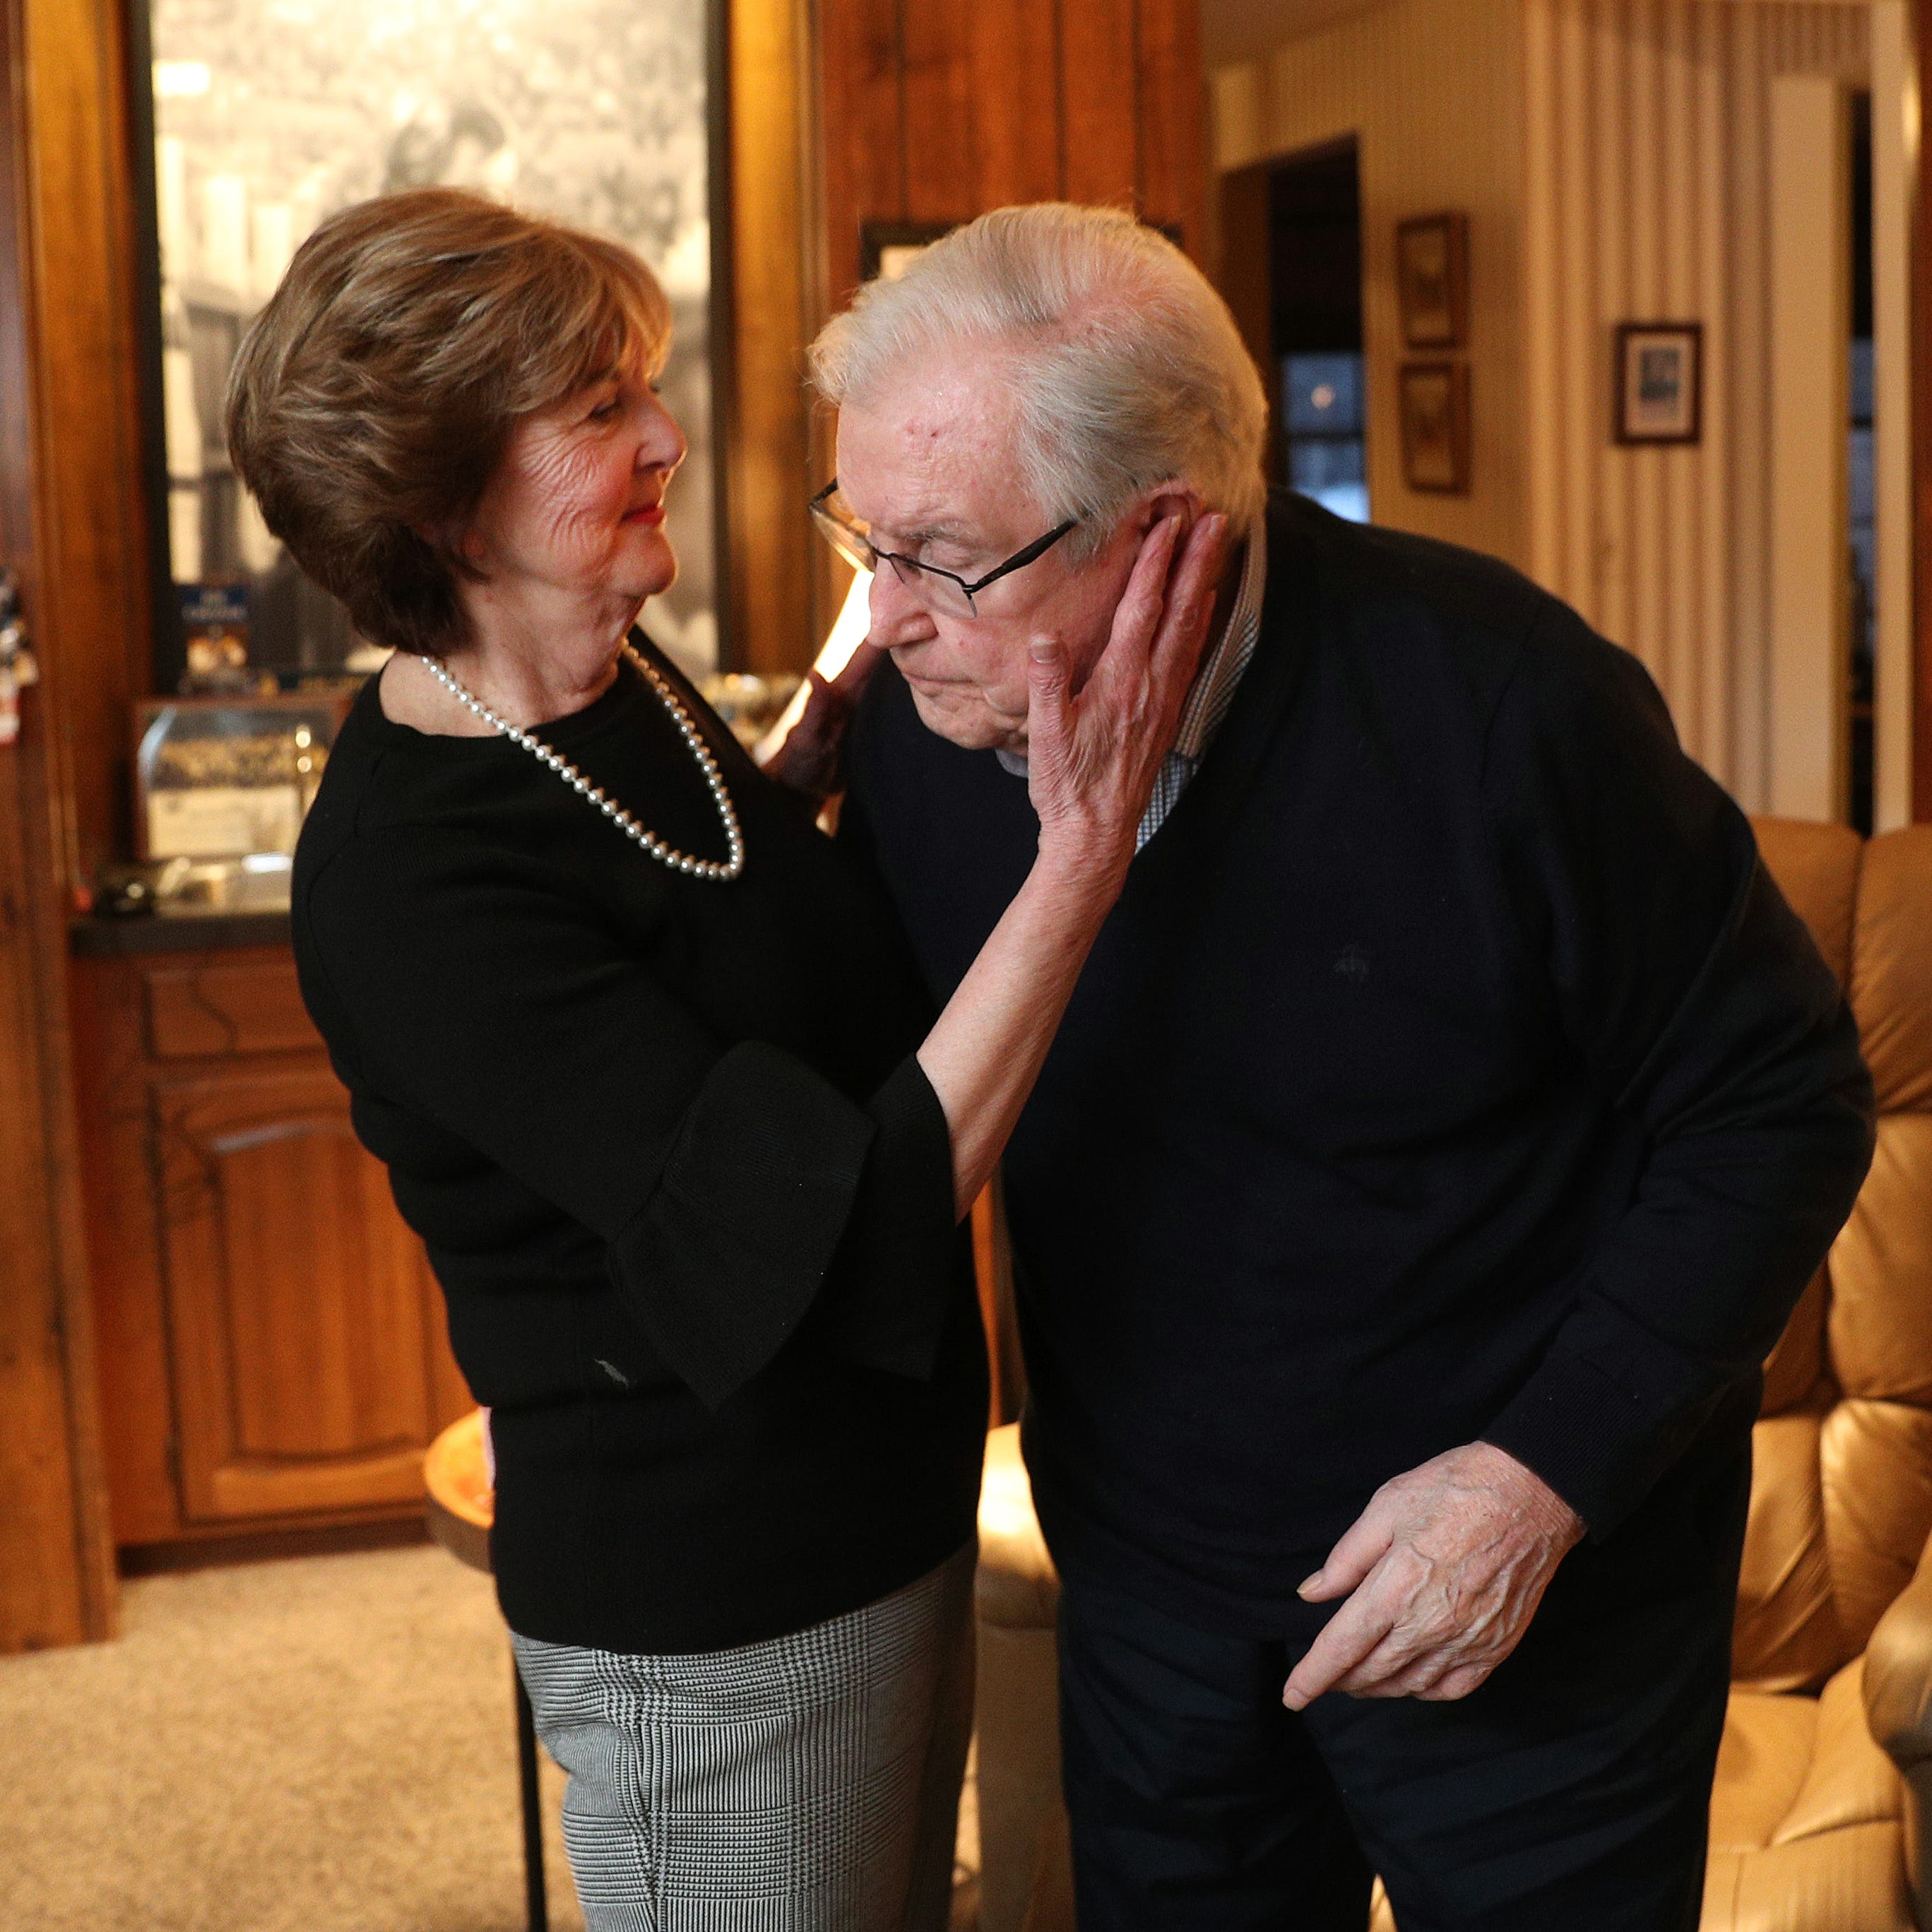 Many sides of a champion: How legendary hockey coach Joe Crozier put family first